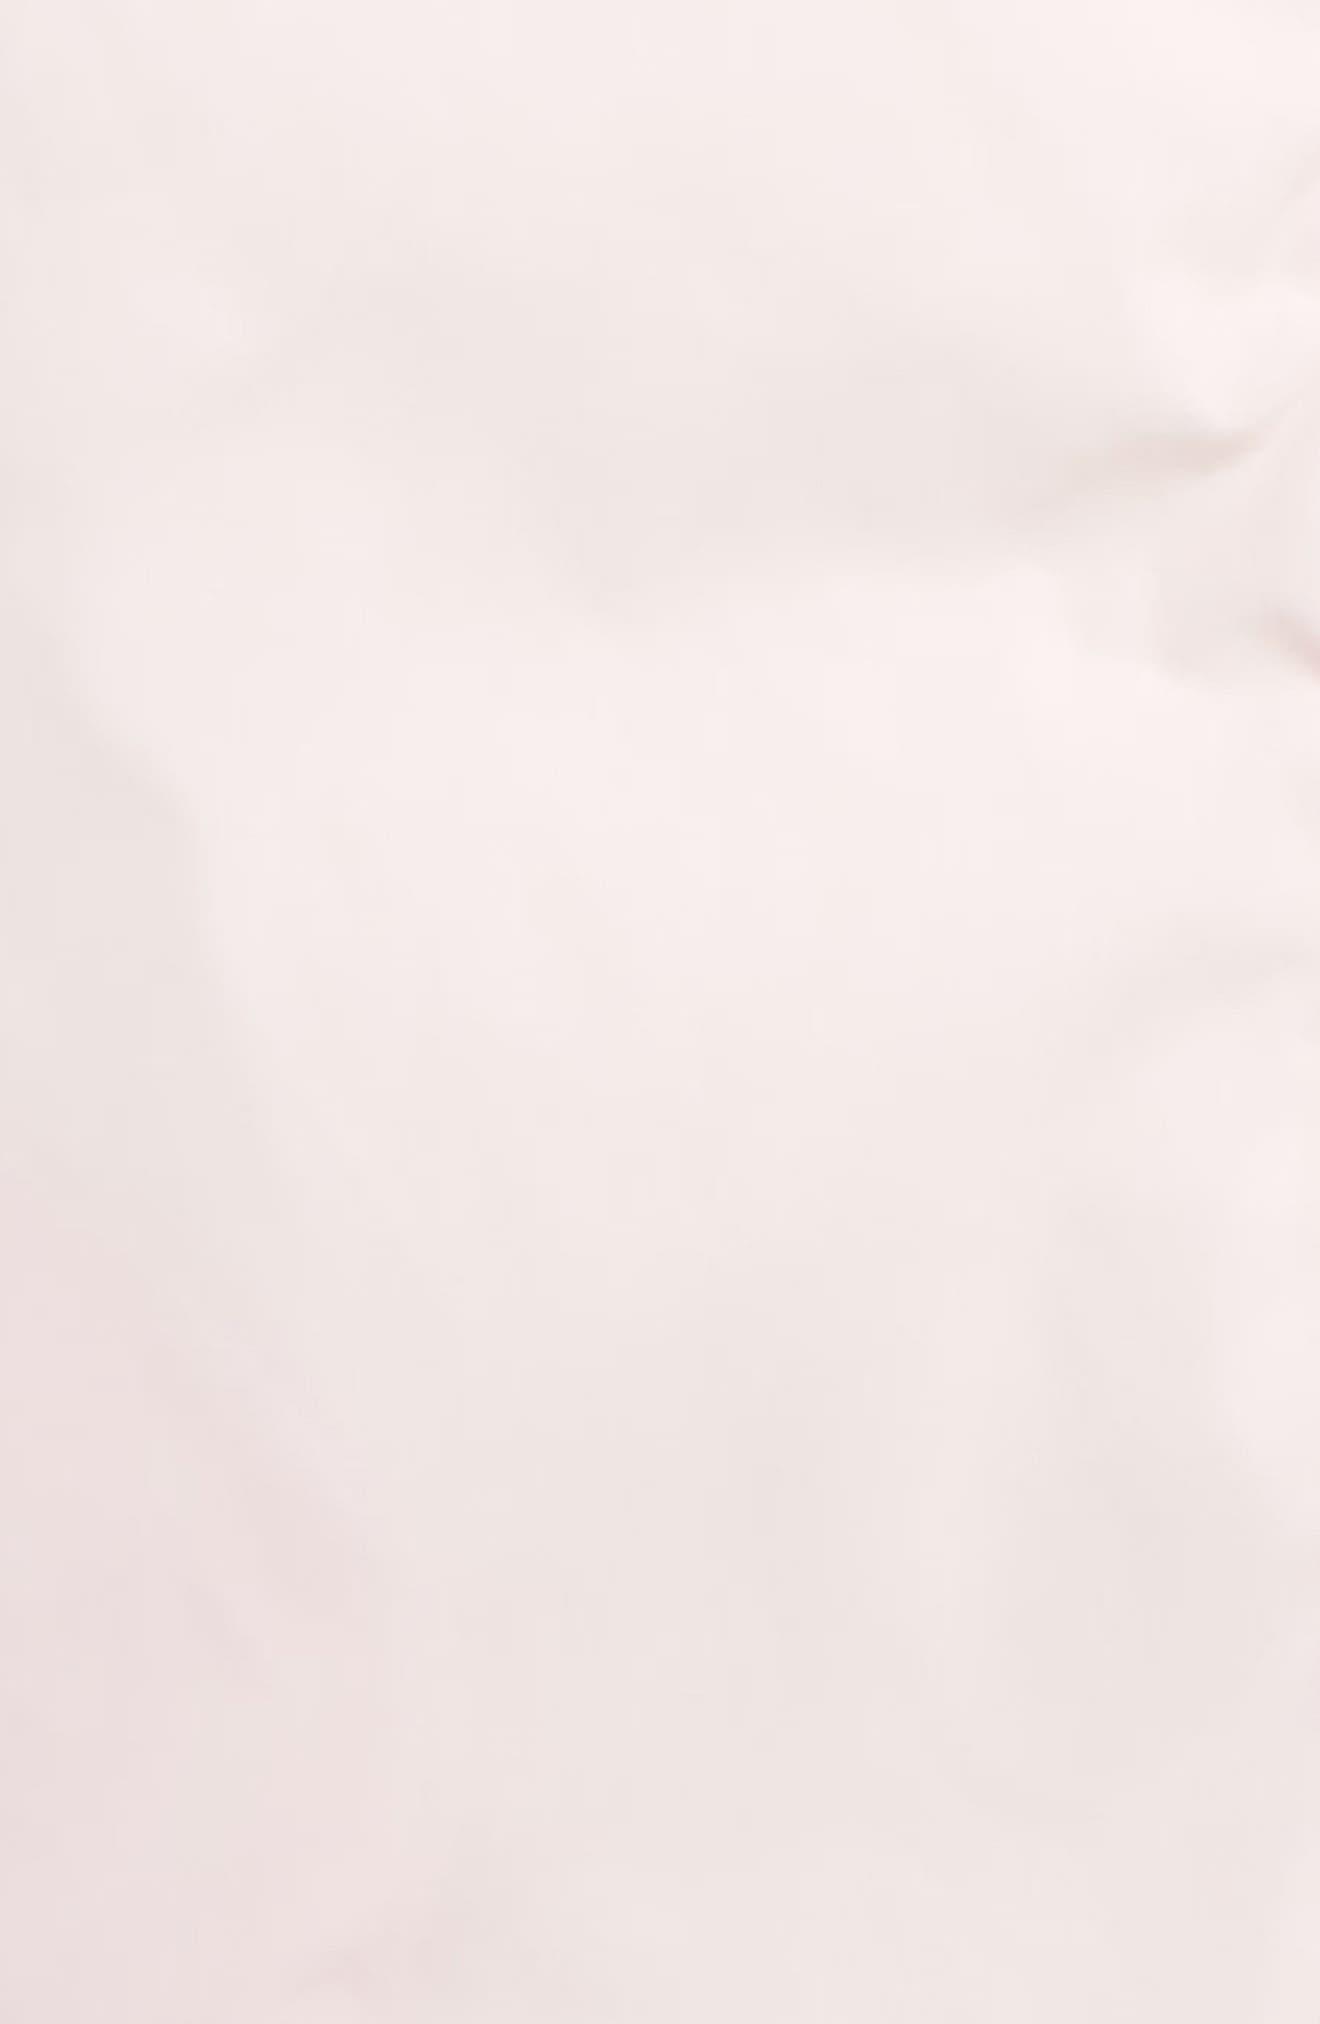 GUCCI, Reversible GG Jacquard Water-Resistant Down Jacket, Alternate thumbnail 3, color, 667